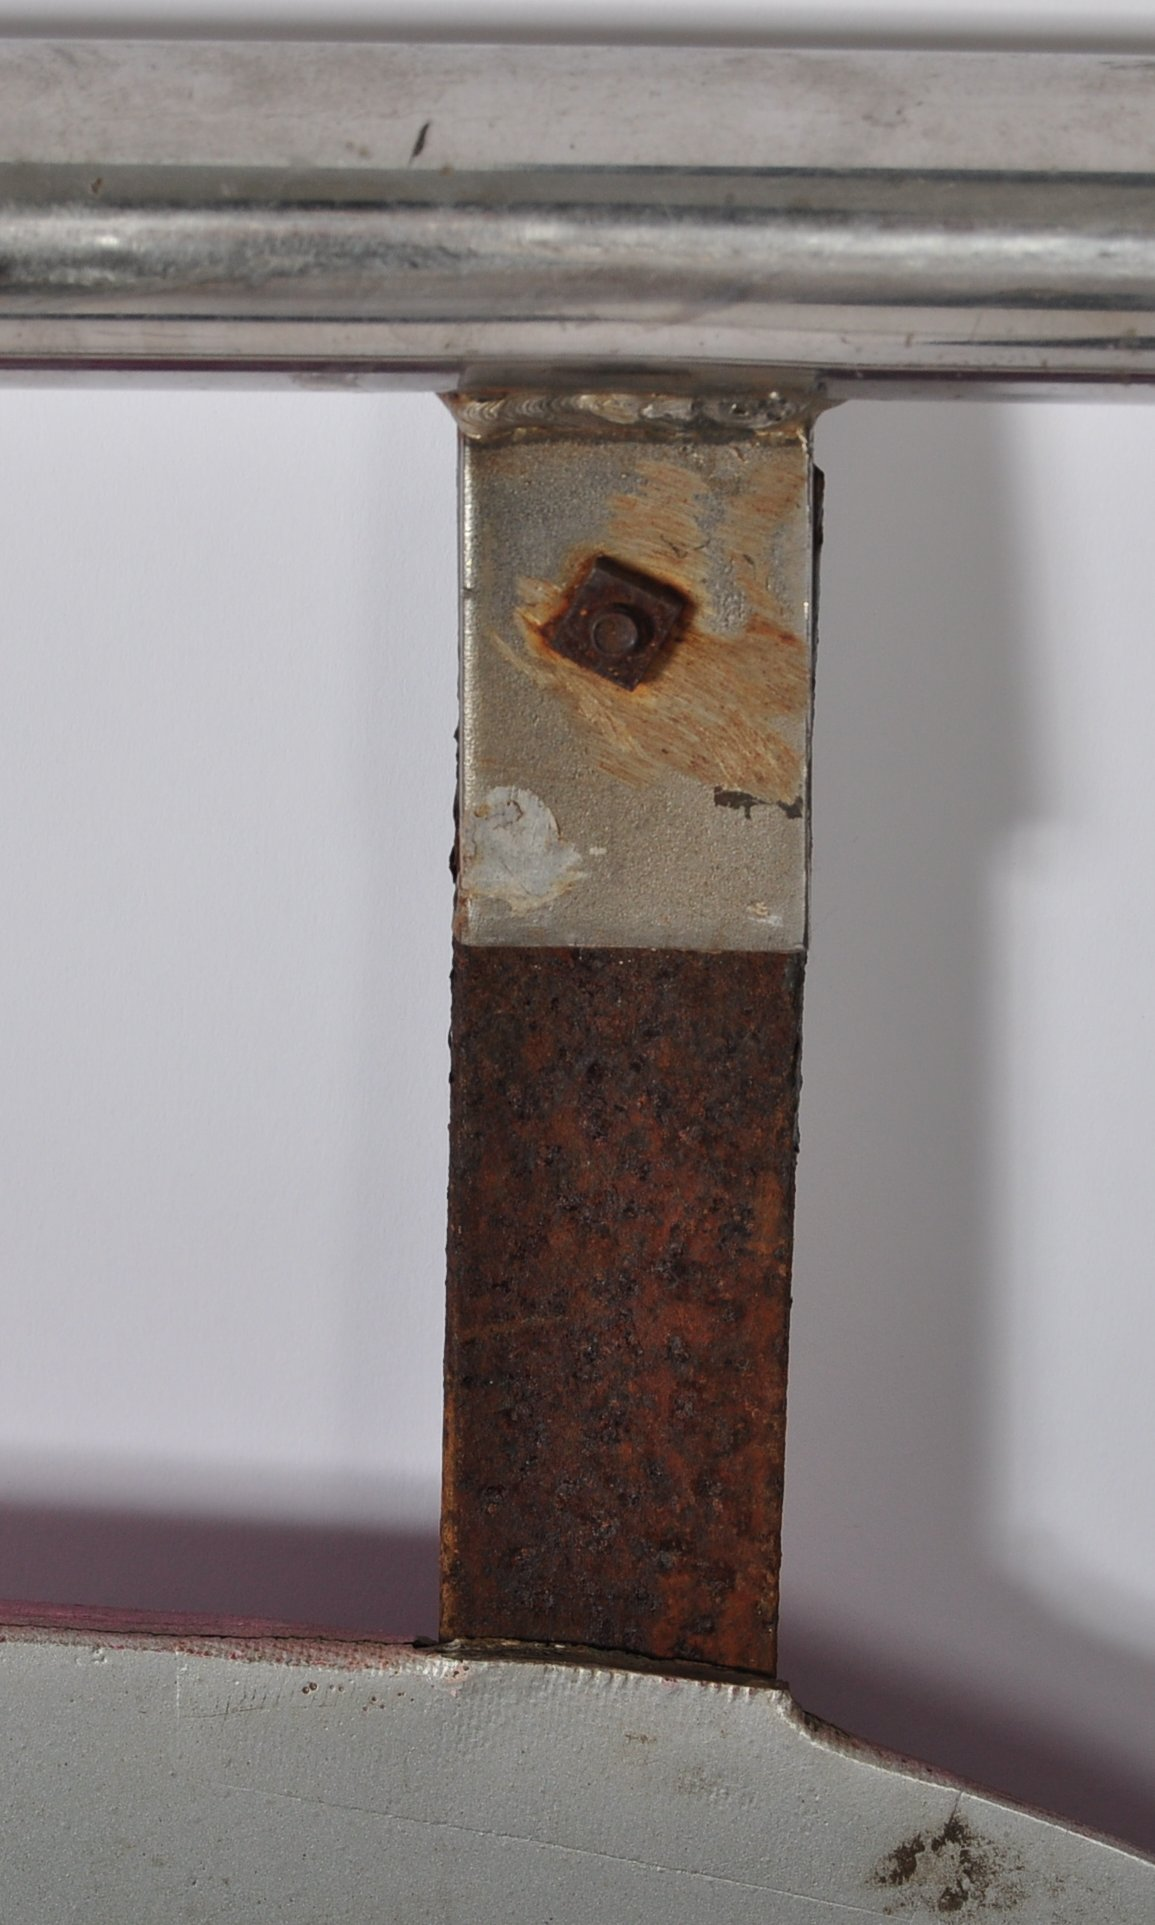 ORIGINAL FAIRGROUND / FUNFAIR OPEN PANELED FENCE / GATE - Image 6 of 6